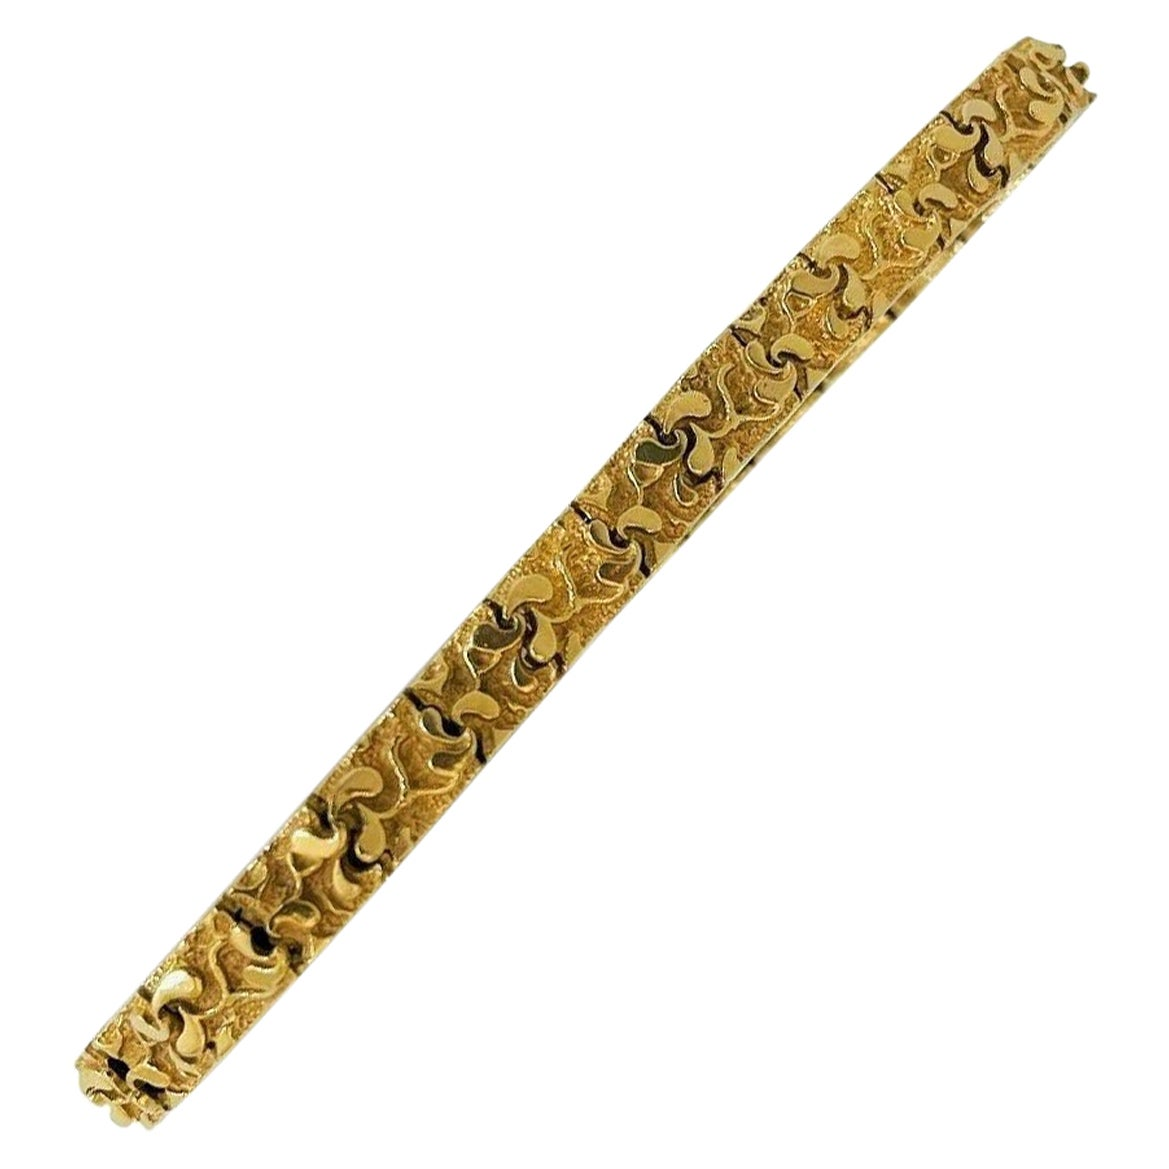 18 Karat Yellow Gold Solid Men's Chunky Nugget Link Bracelet